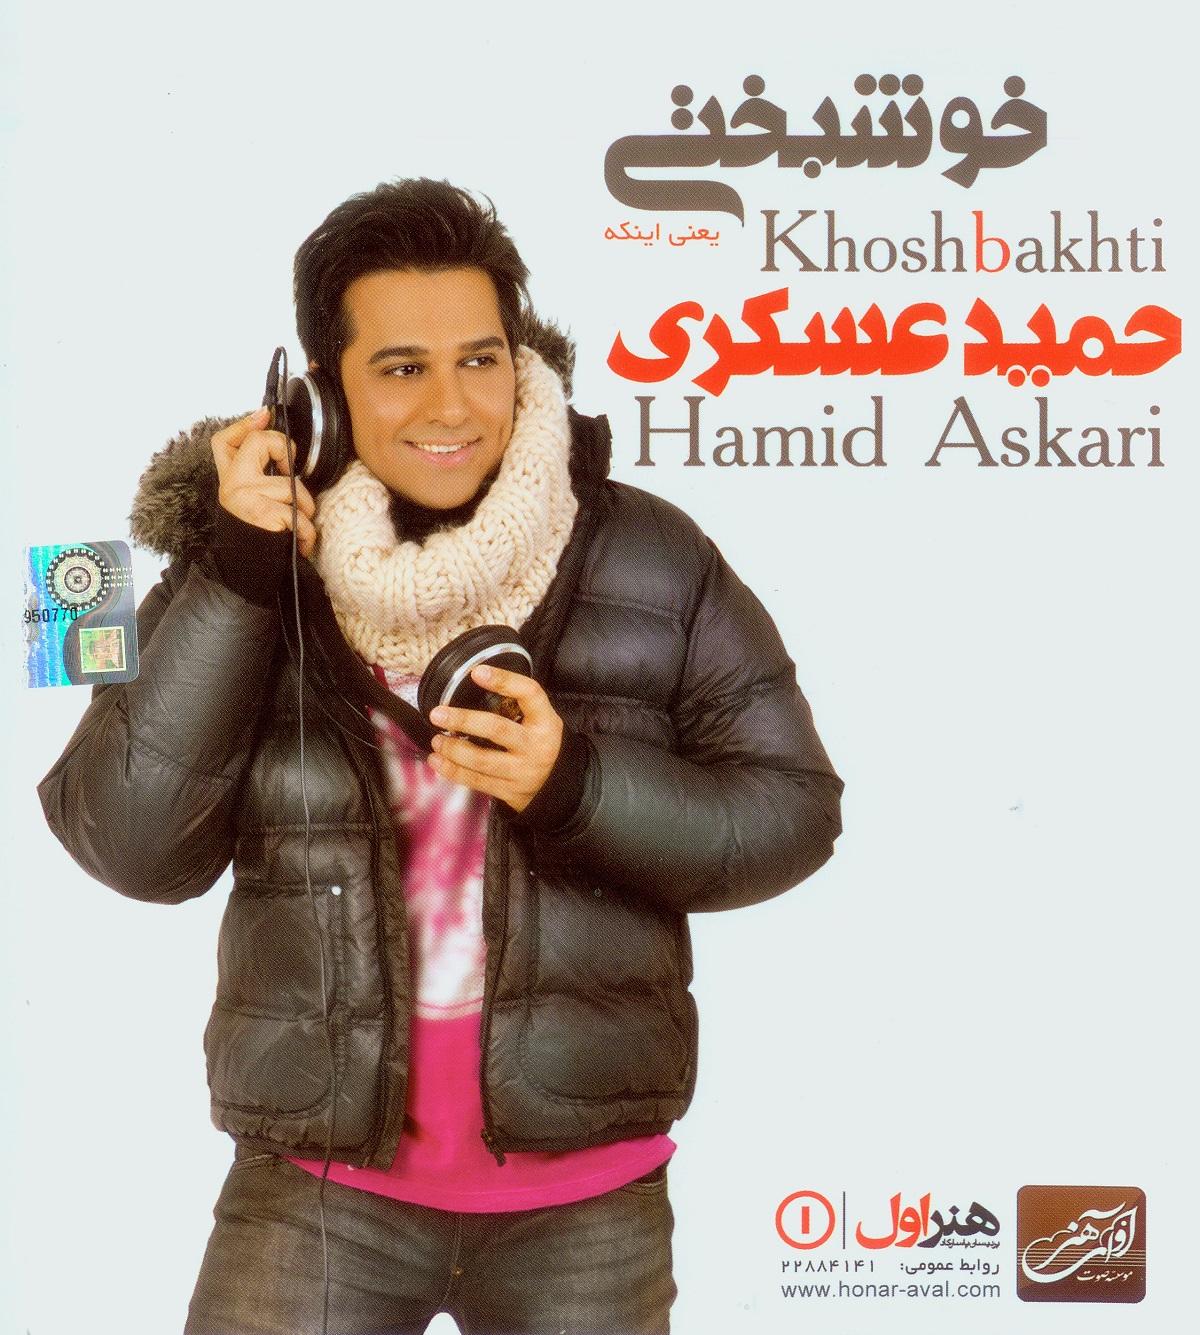 http://rozup.ir/up/dailyalbums/Hamid%20Askari%20-%20Khoshbakhti%20(dailyalbums.co.nr).jpg